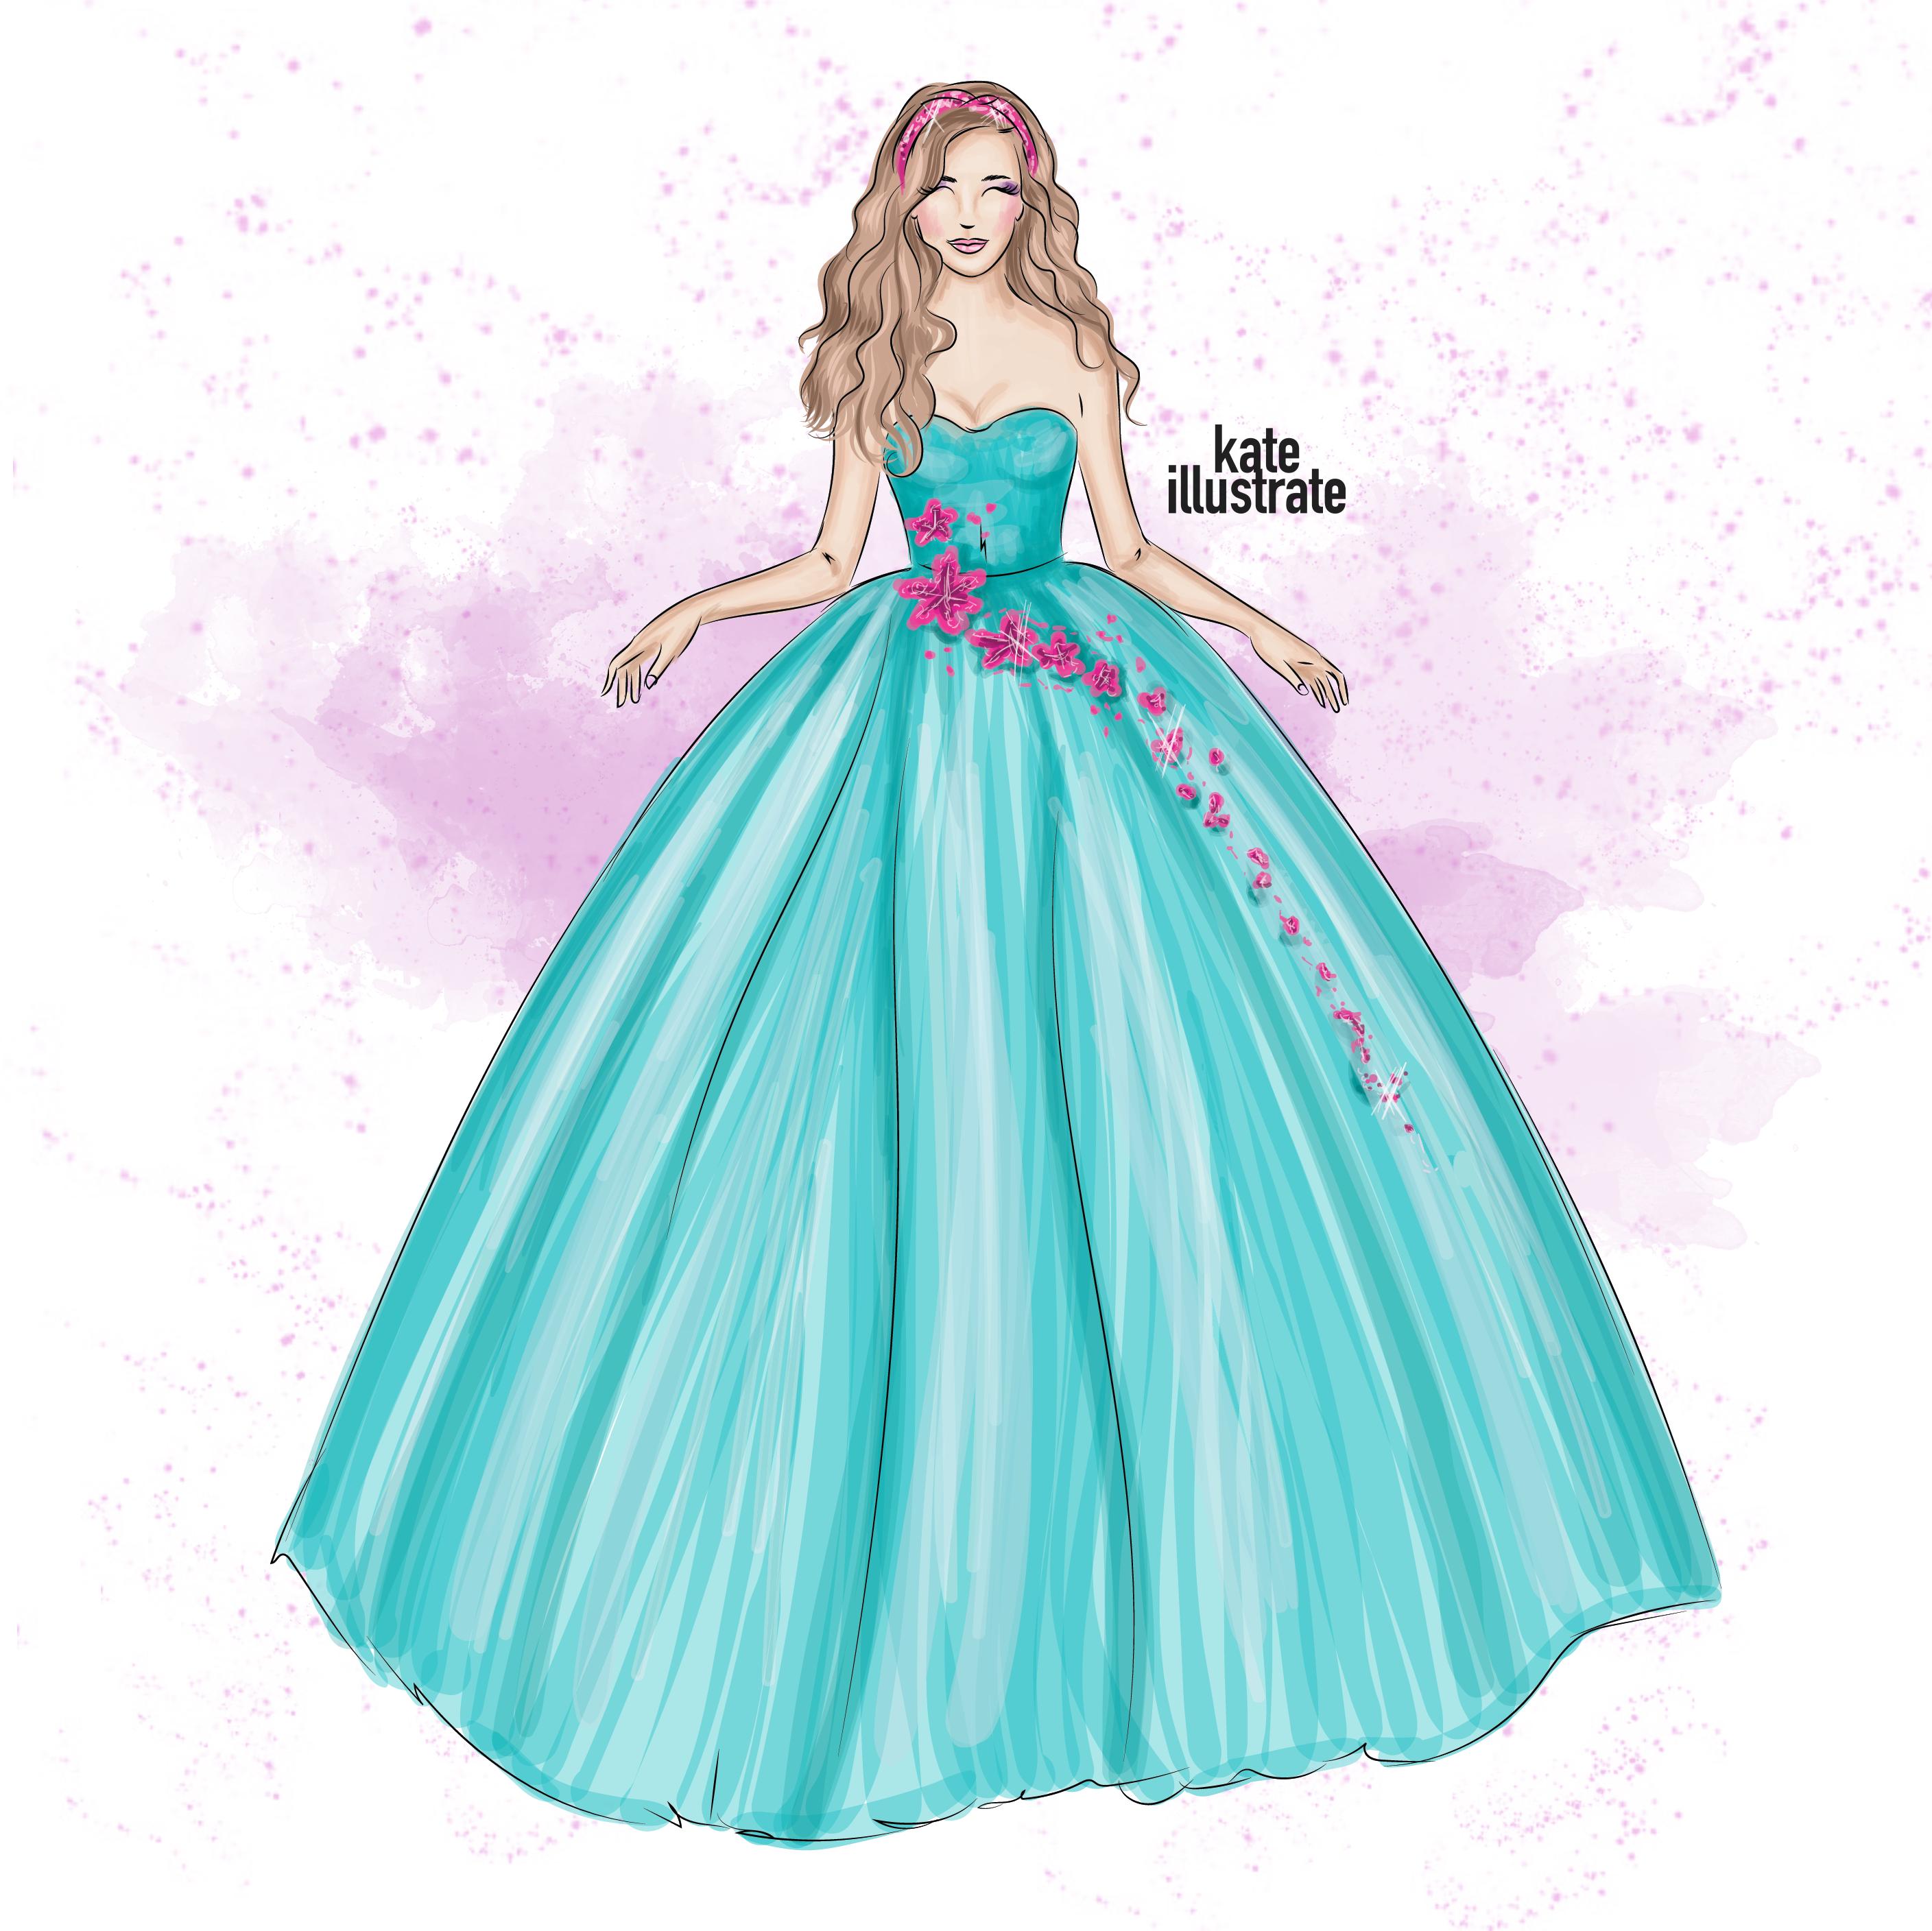 kateillustrate princess illustration